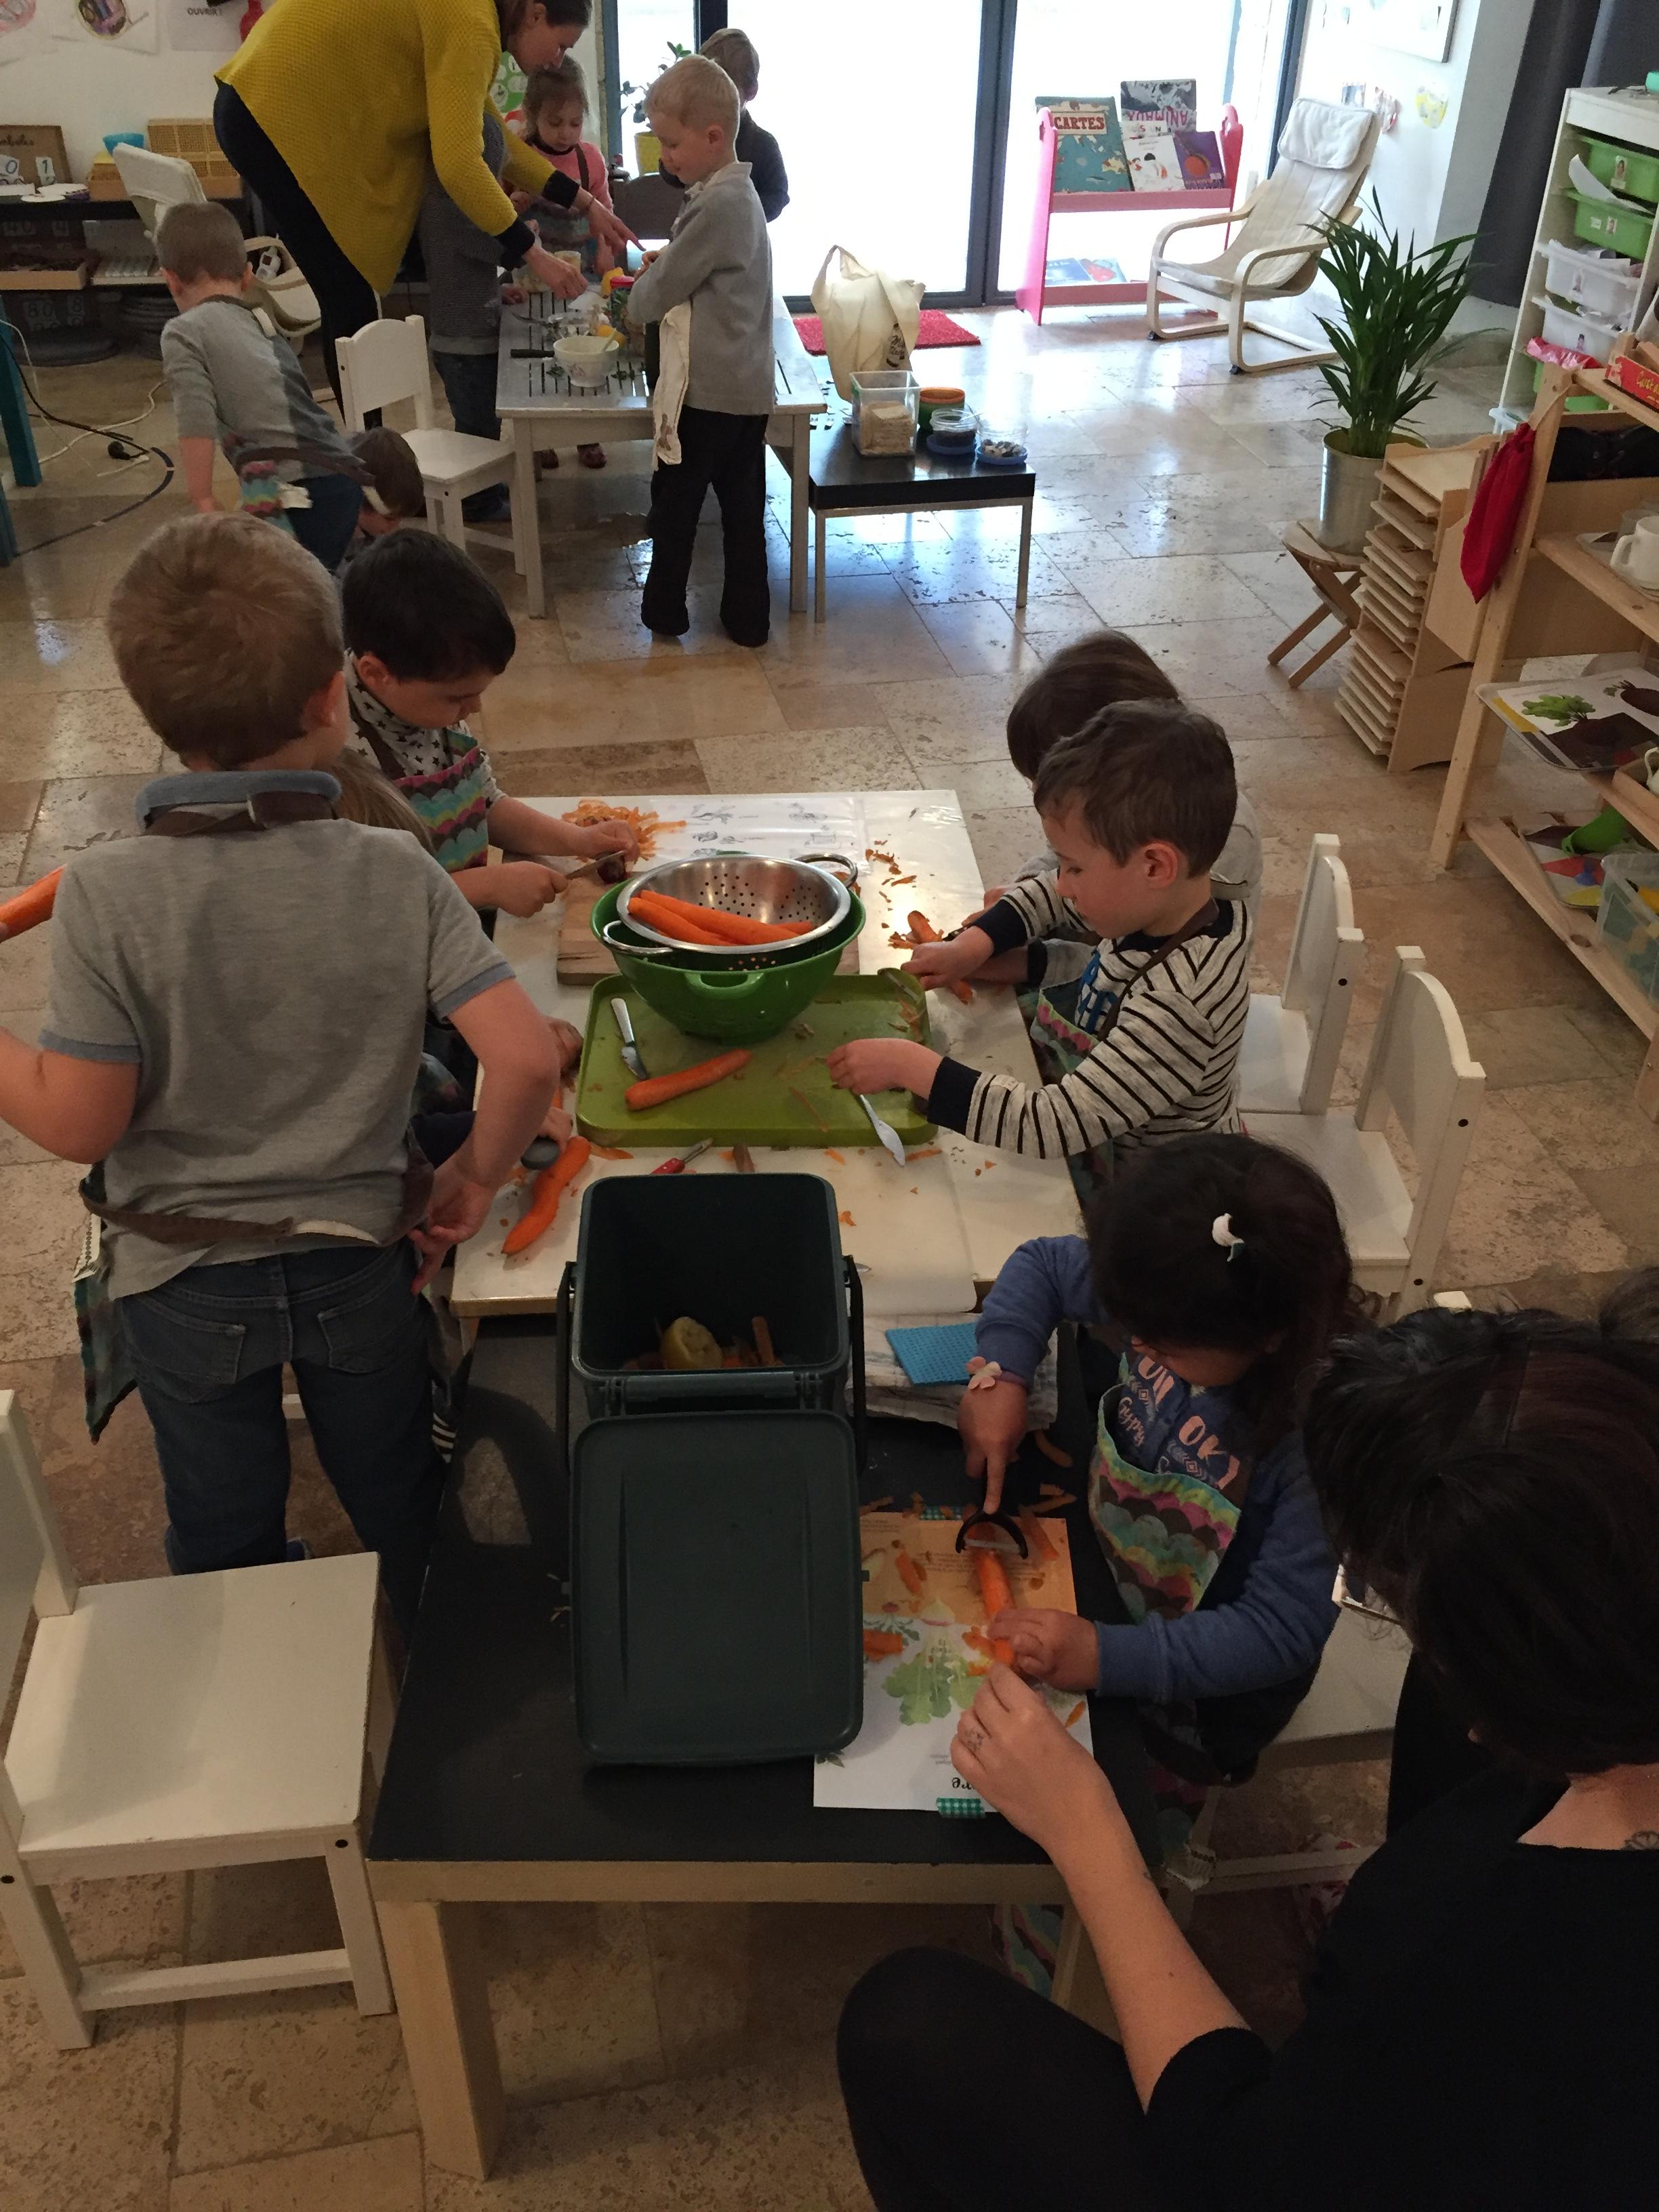 école-Montessori-les-oliviers-207